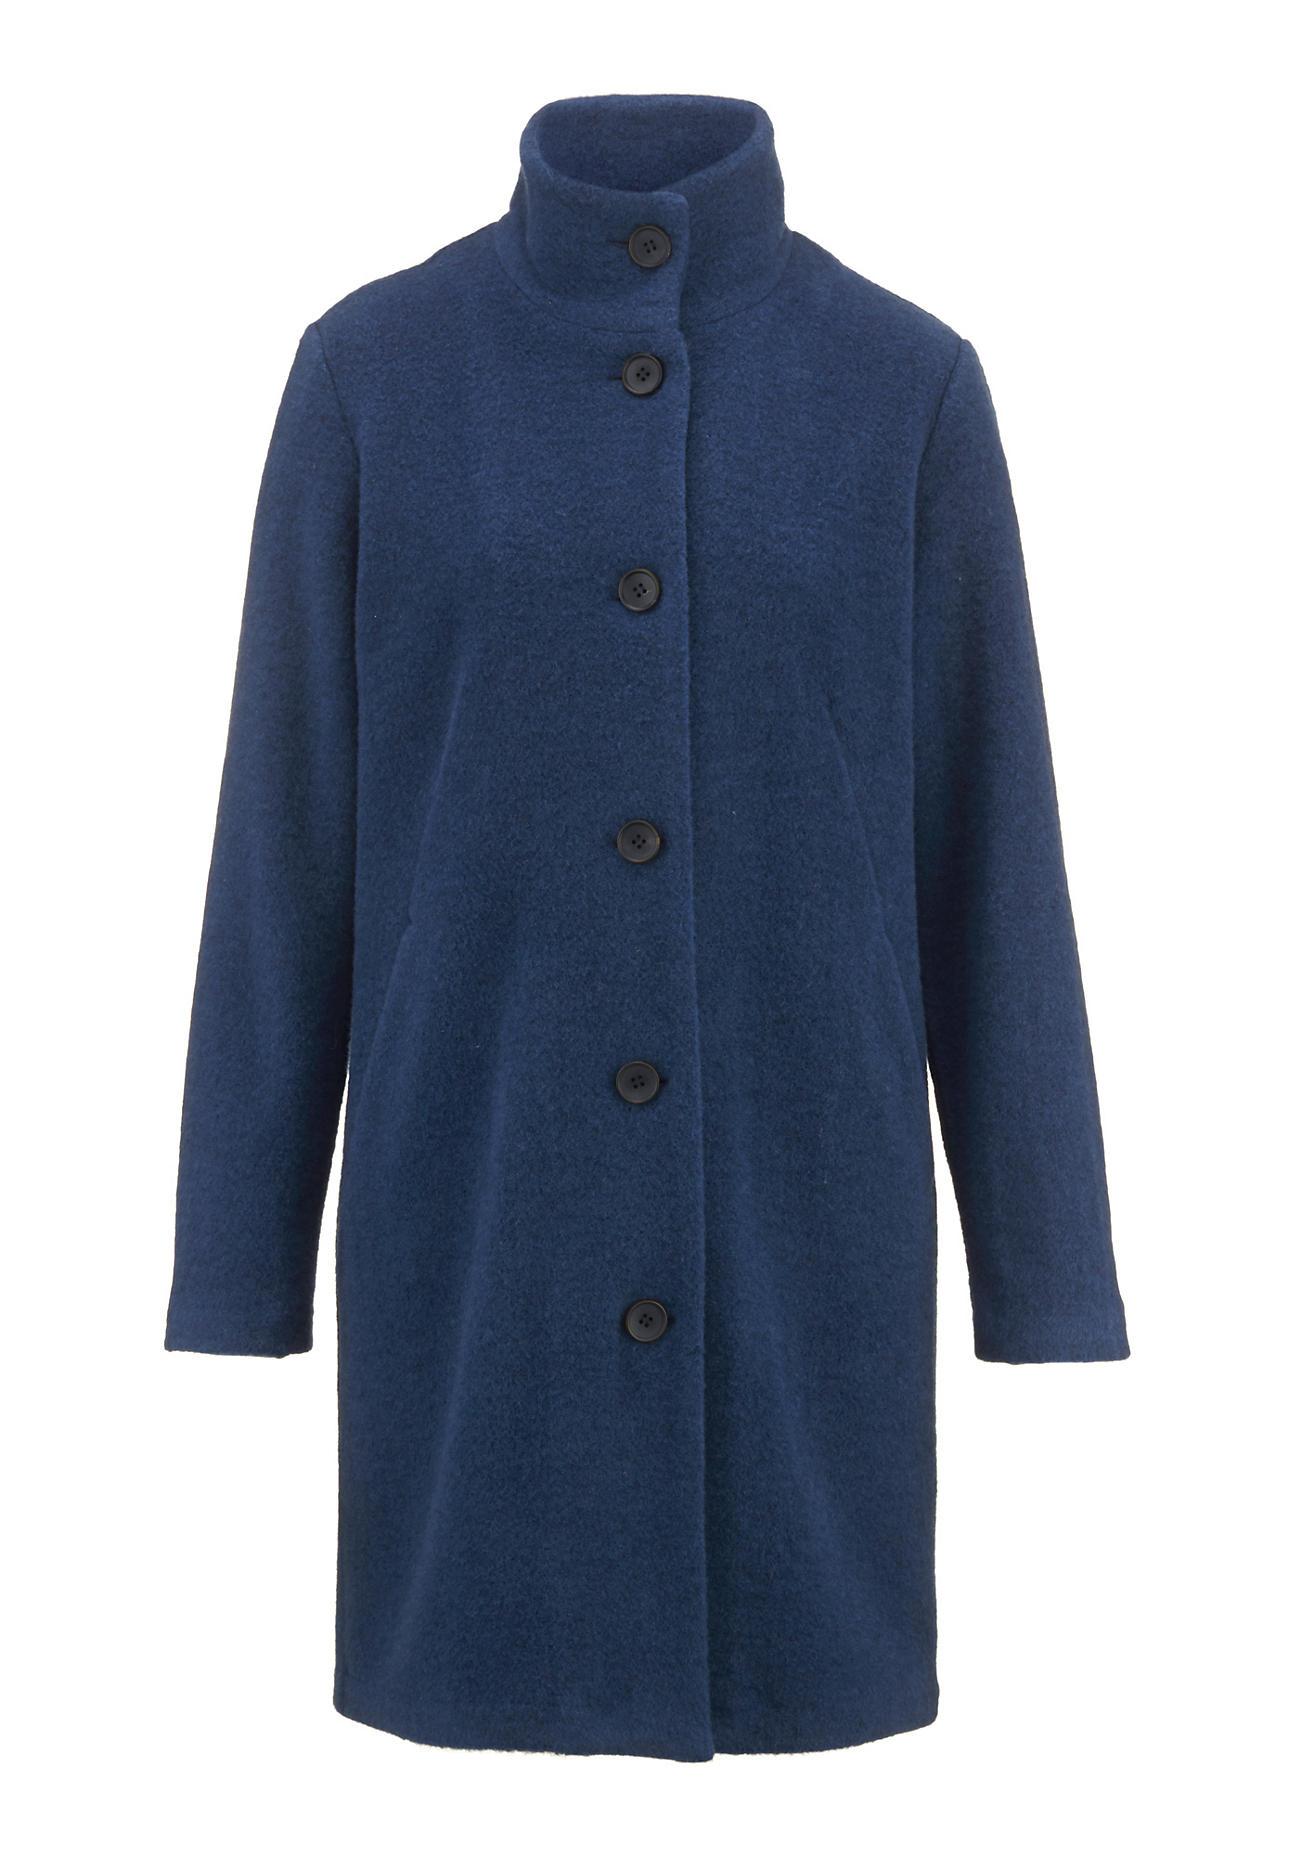 hessnatur Damen Wollfleece-Mantel aus Bio-Schurwolle – blau – Größe 44   Sportbekleidung > Sportmäntel > Fleecemäntel   hessnatur